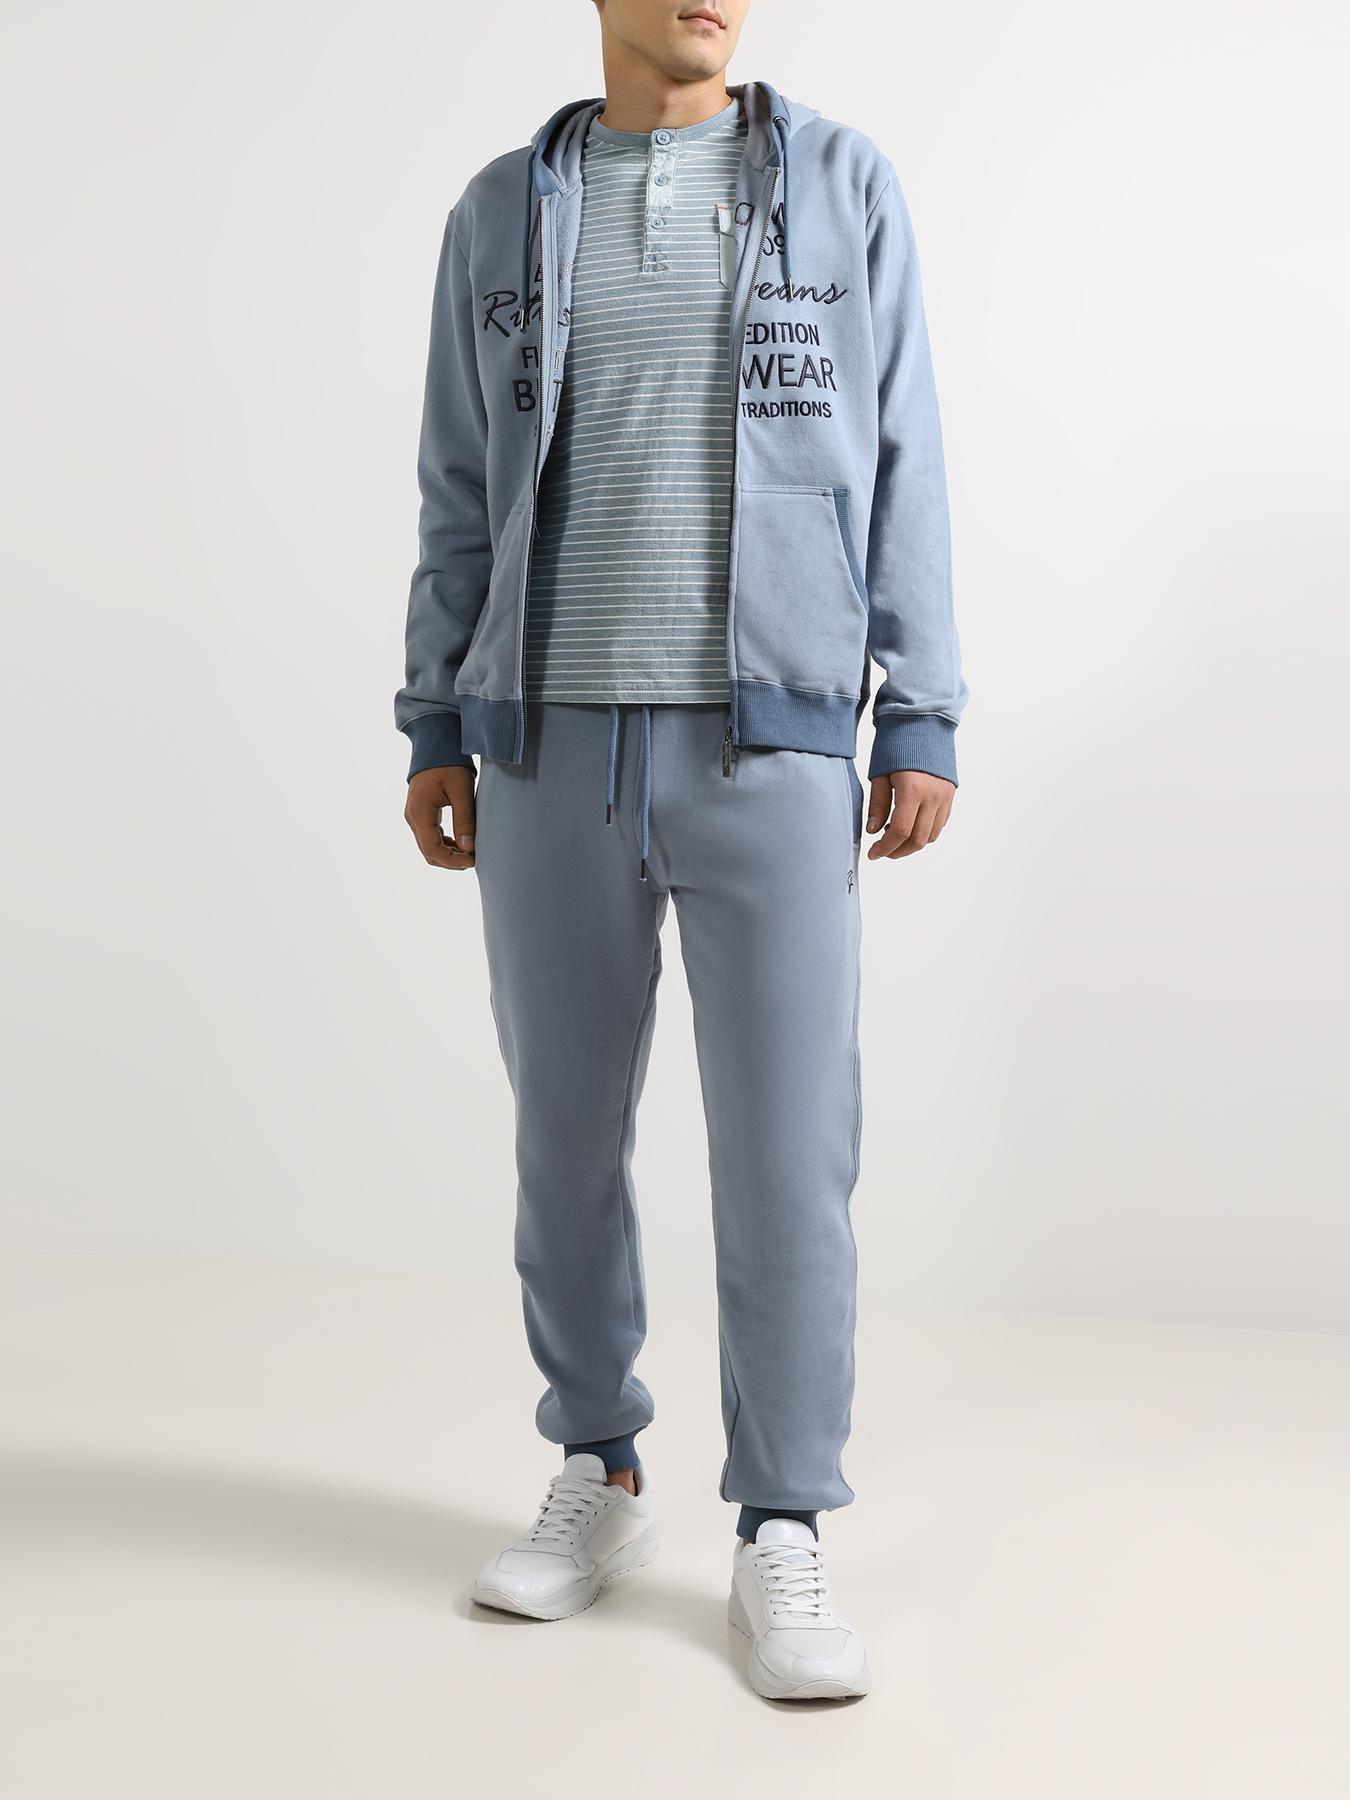 Брюки Ritter Jeans Спортивные брюки брюки спортивные sugarlife sugarlife mp002xw0xjil